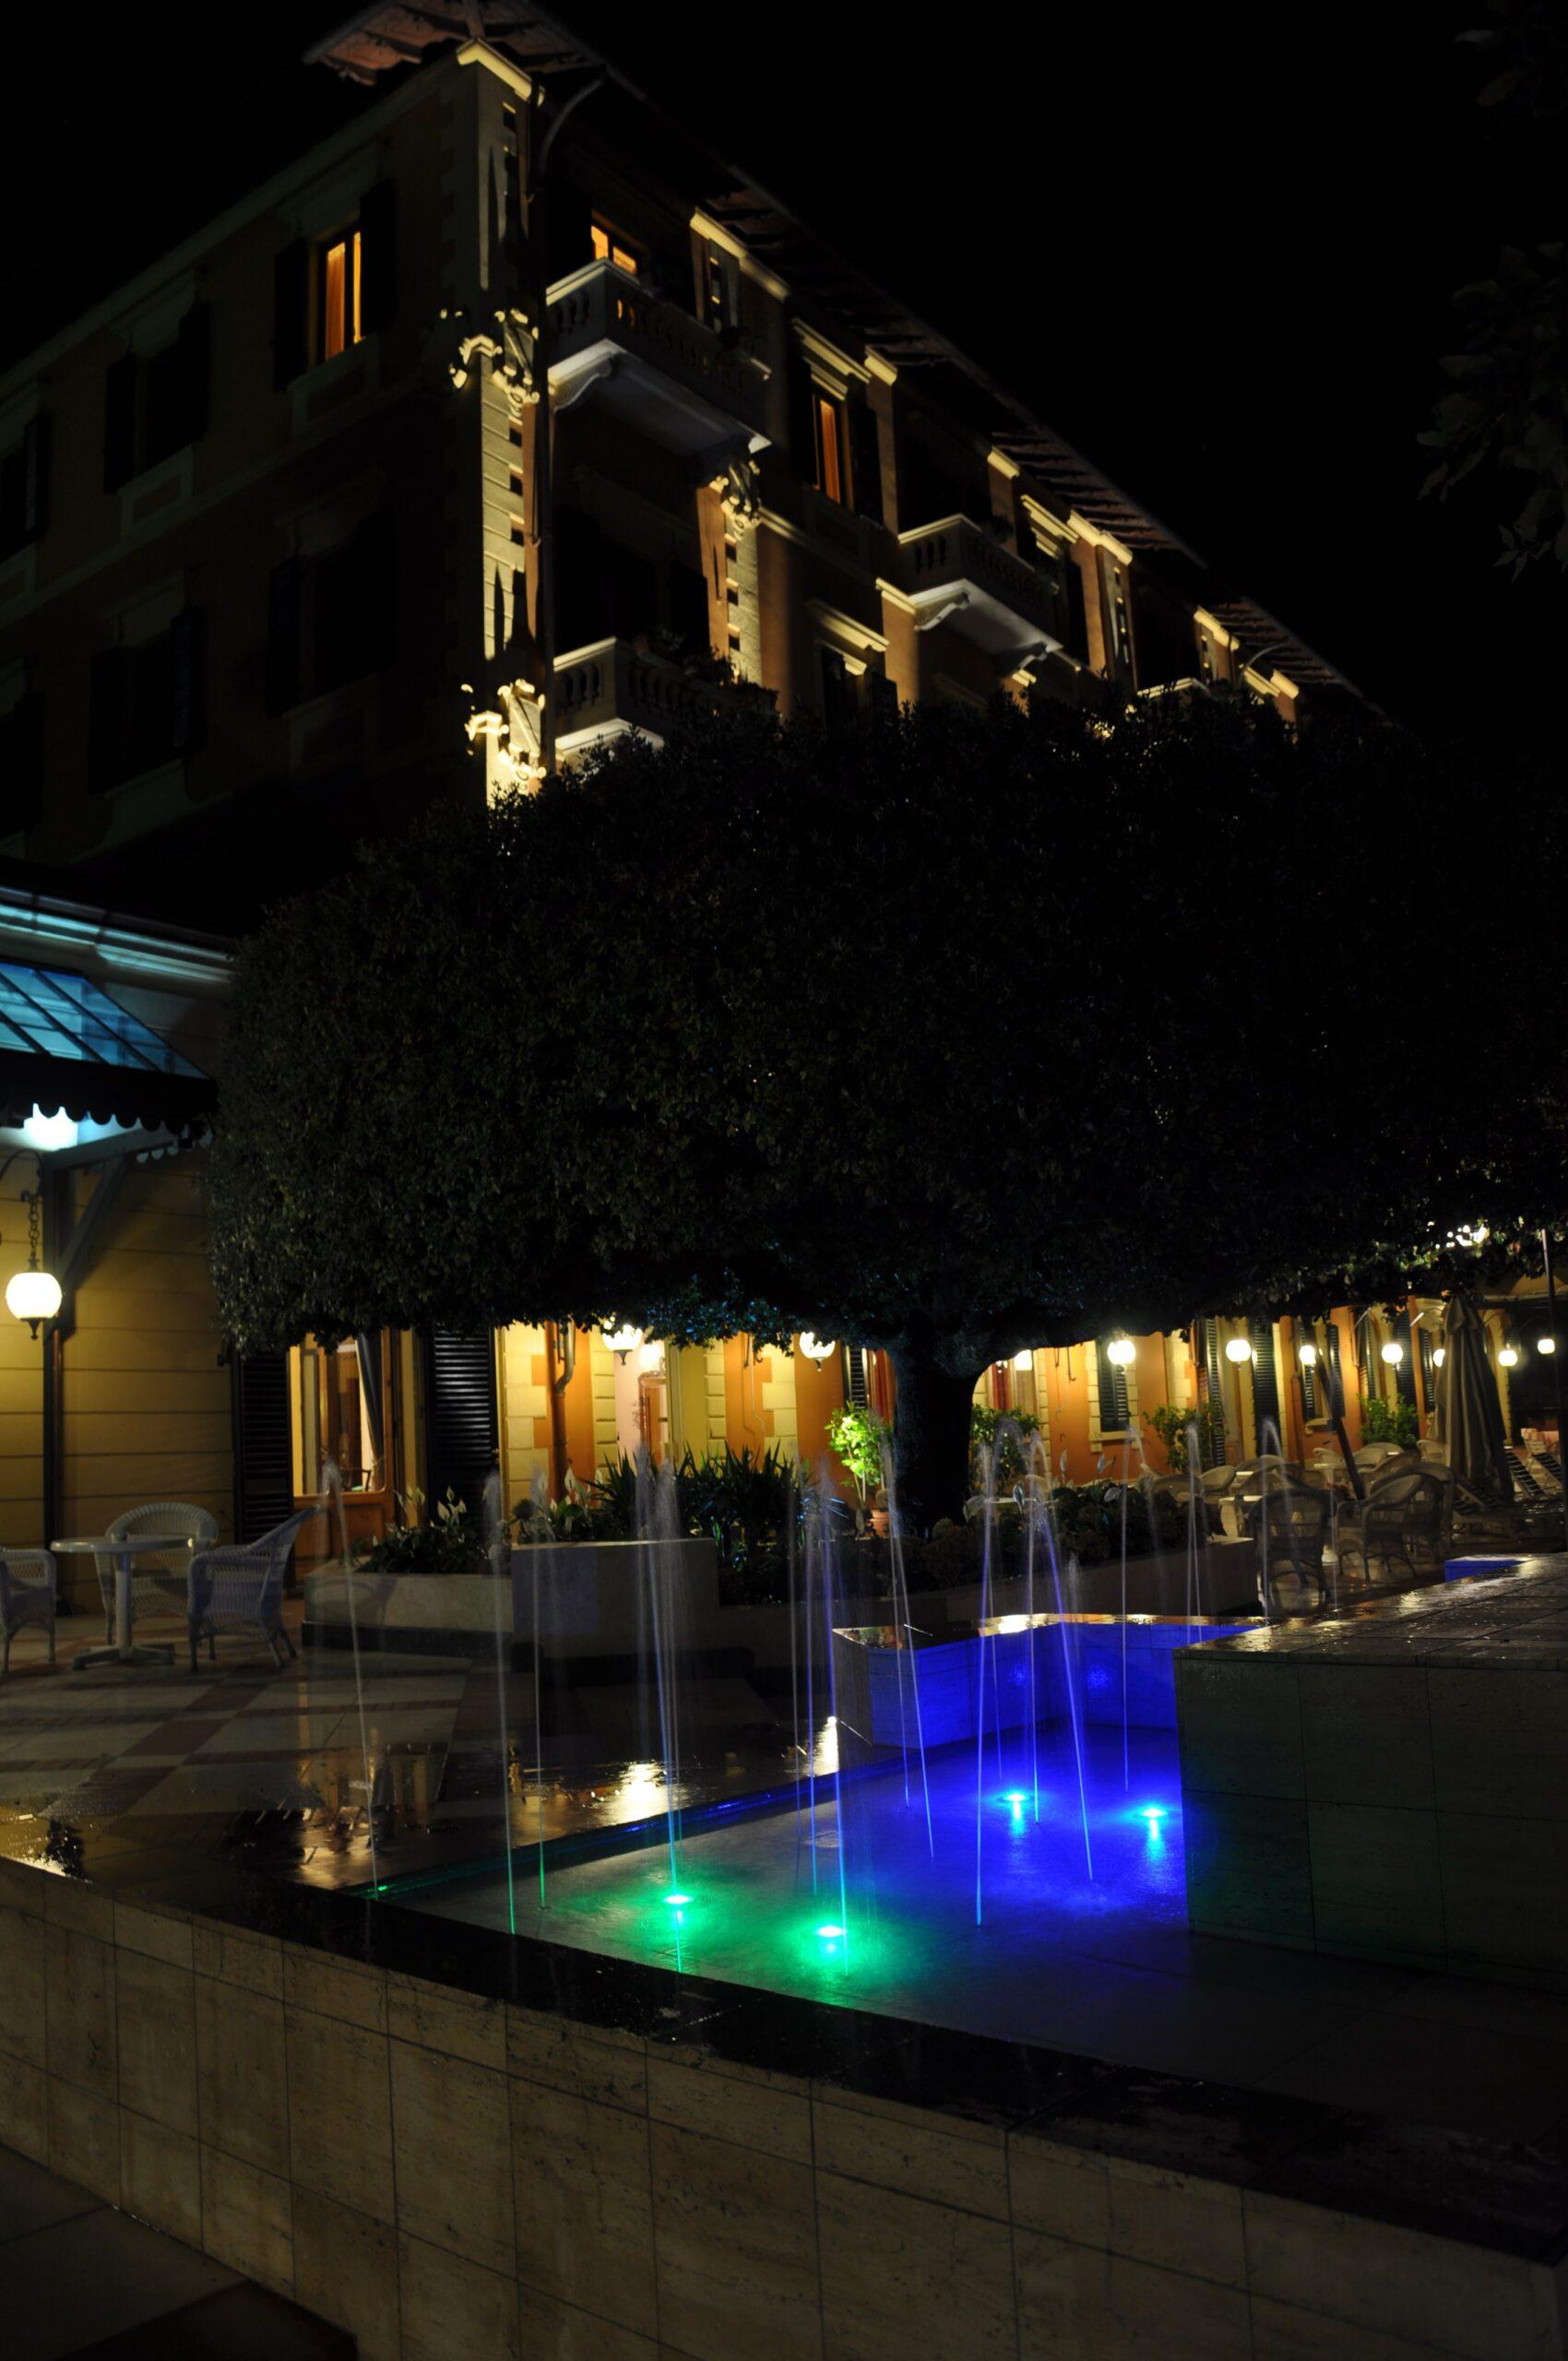 granpalace hotel_05-LR